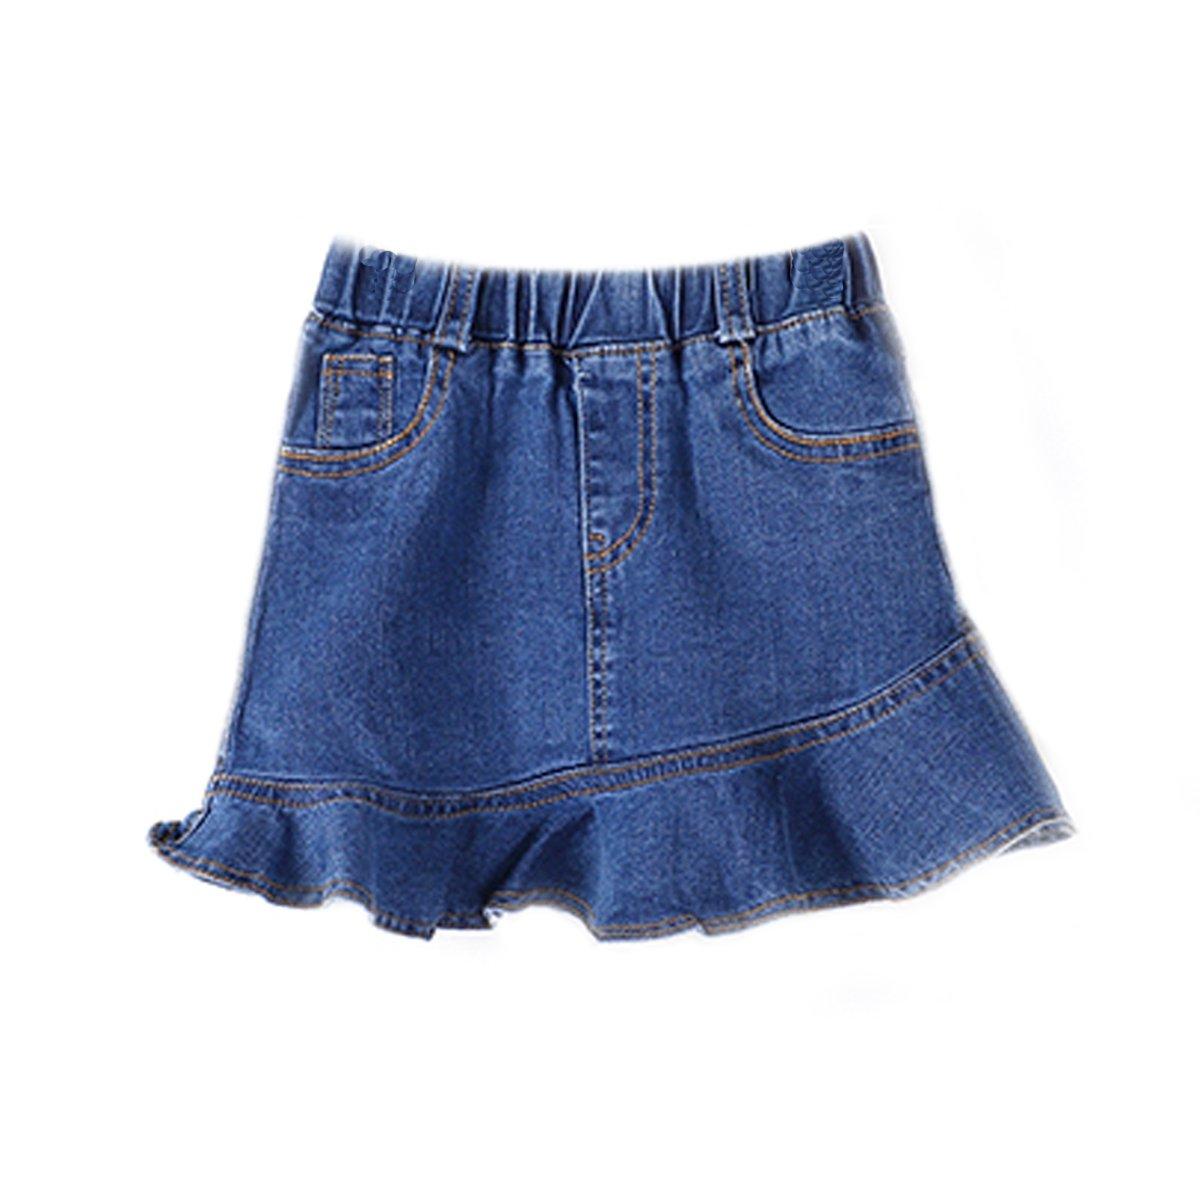 NABER Kids Girls' Fashion Elastic Waist Pleated Tutu Denim Skirt Age 3-10 Years (5-6 Years)